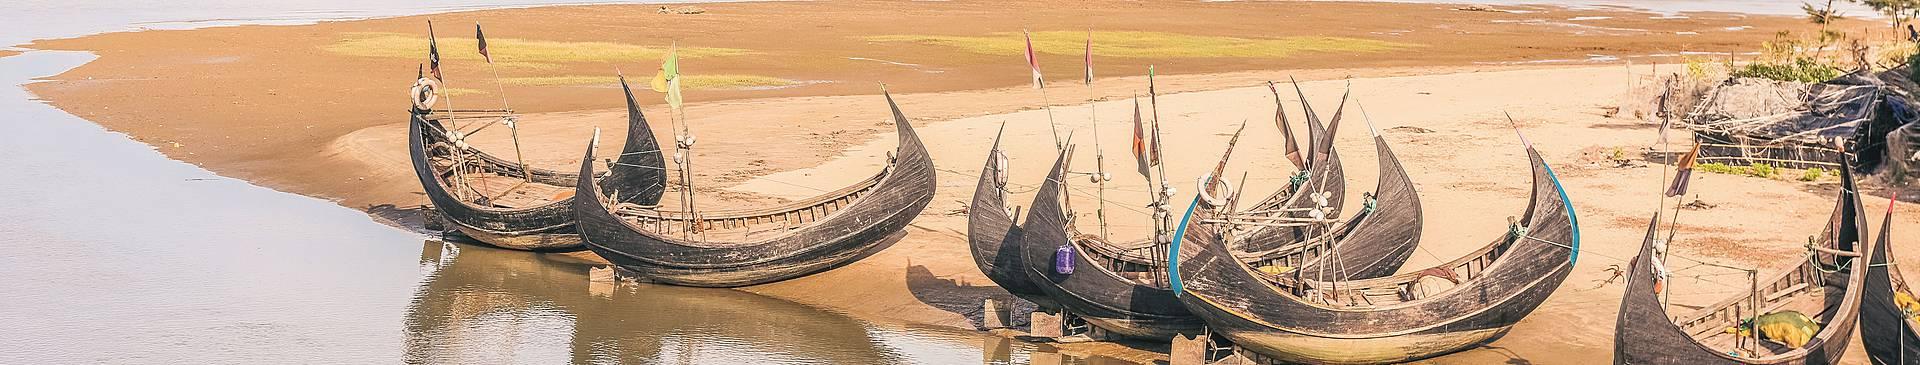 Voyage plage au Bangladesh